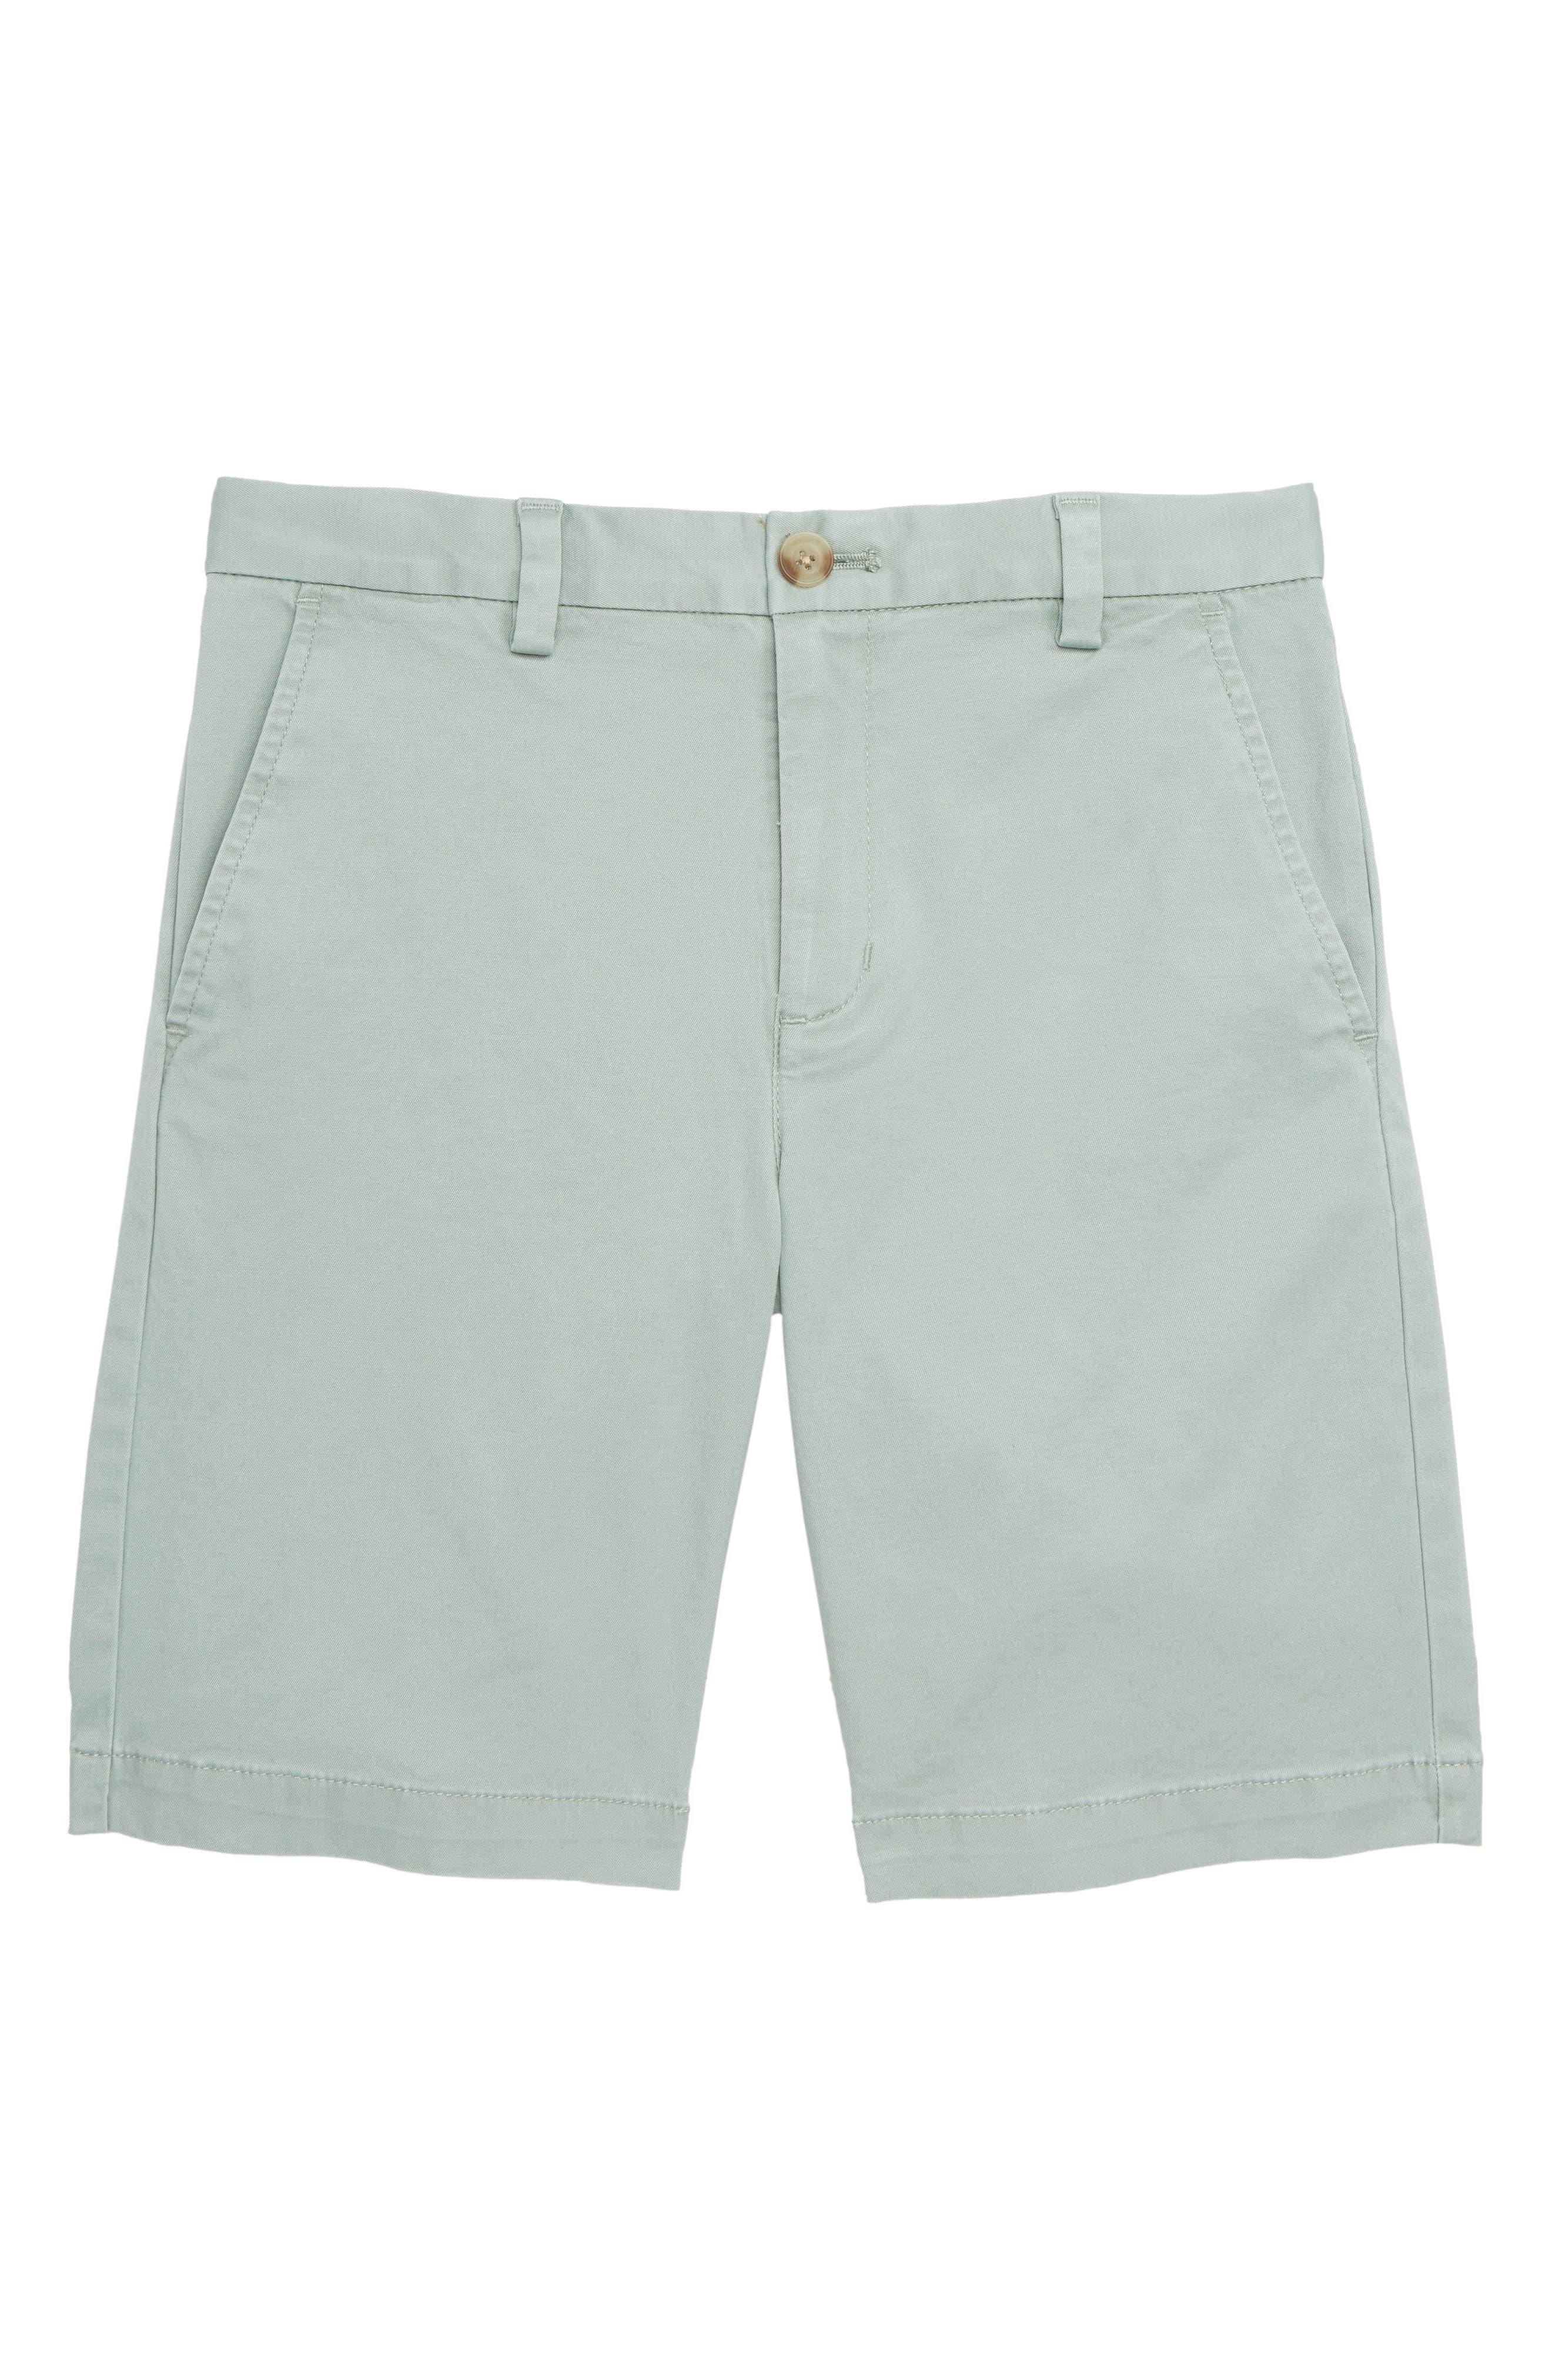 Stretch Breaker Shorts,                         Main,                         color, 020